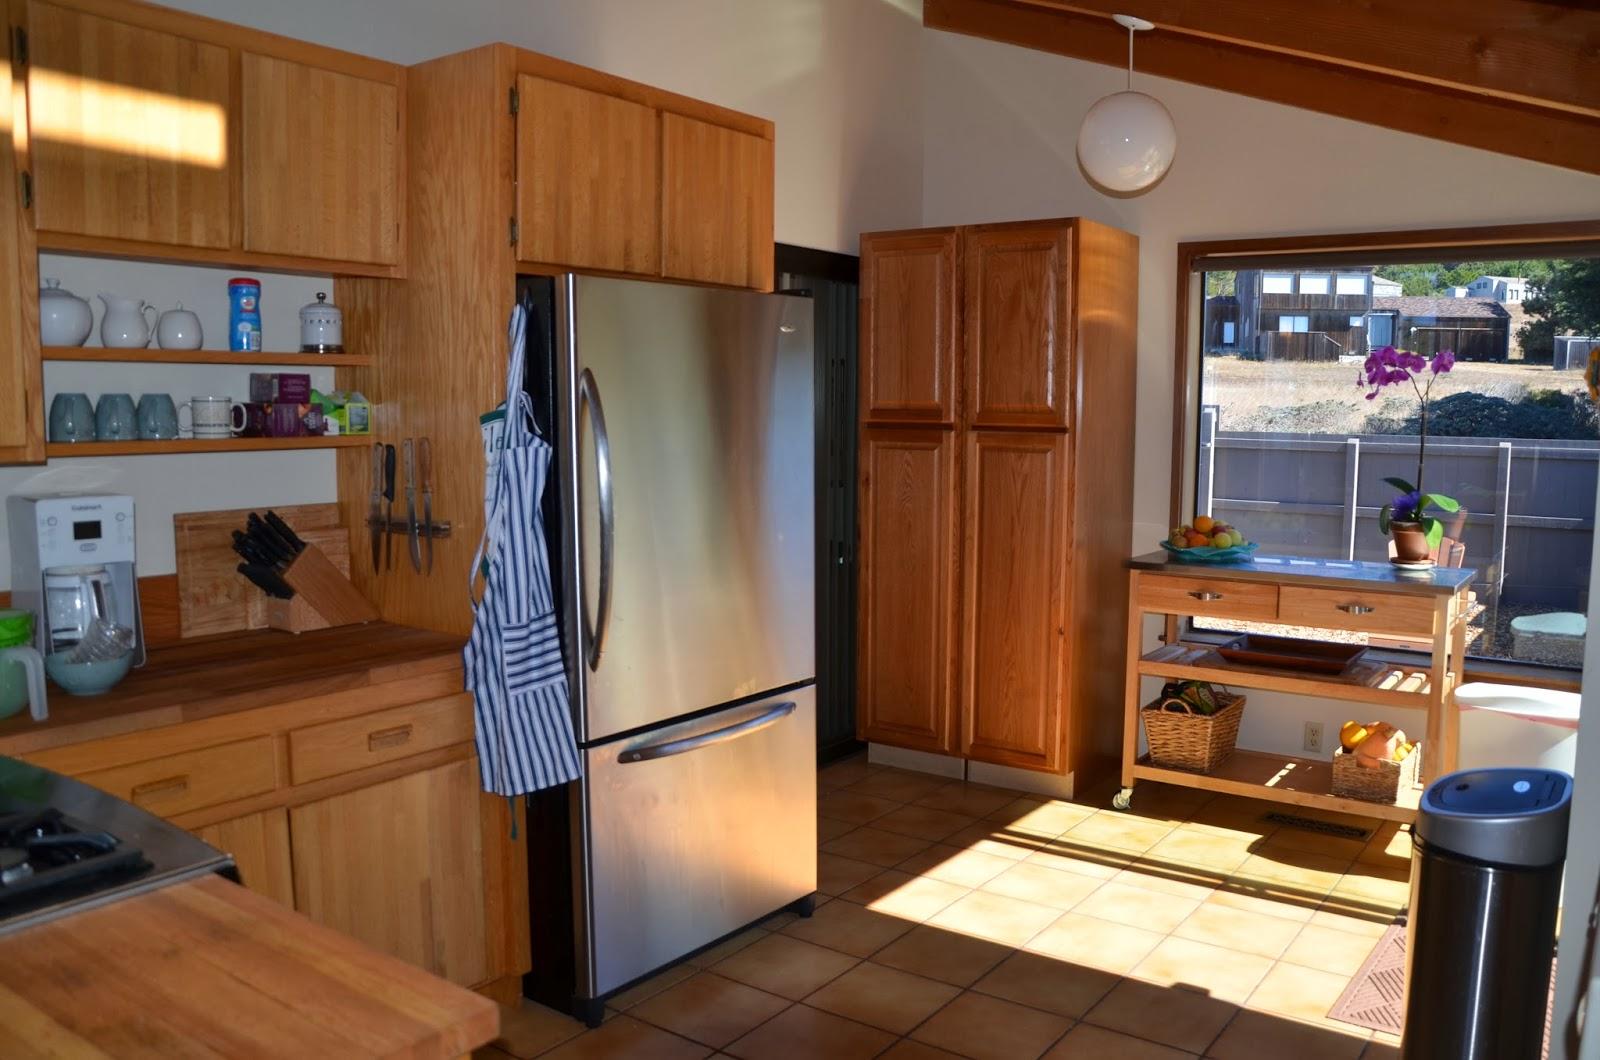 The awesome Elegant corner kitchen pantry image